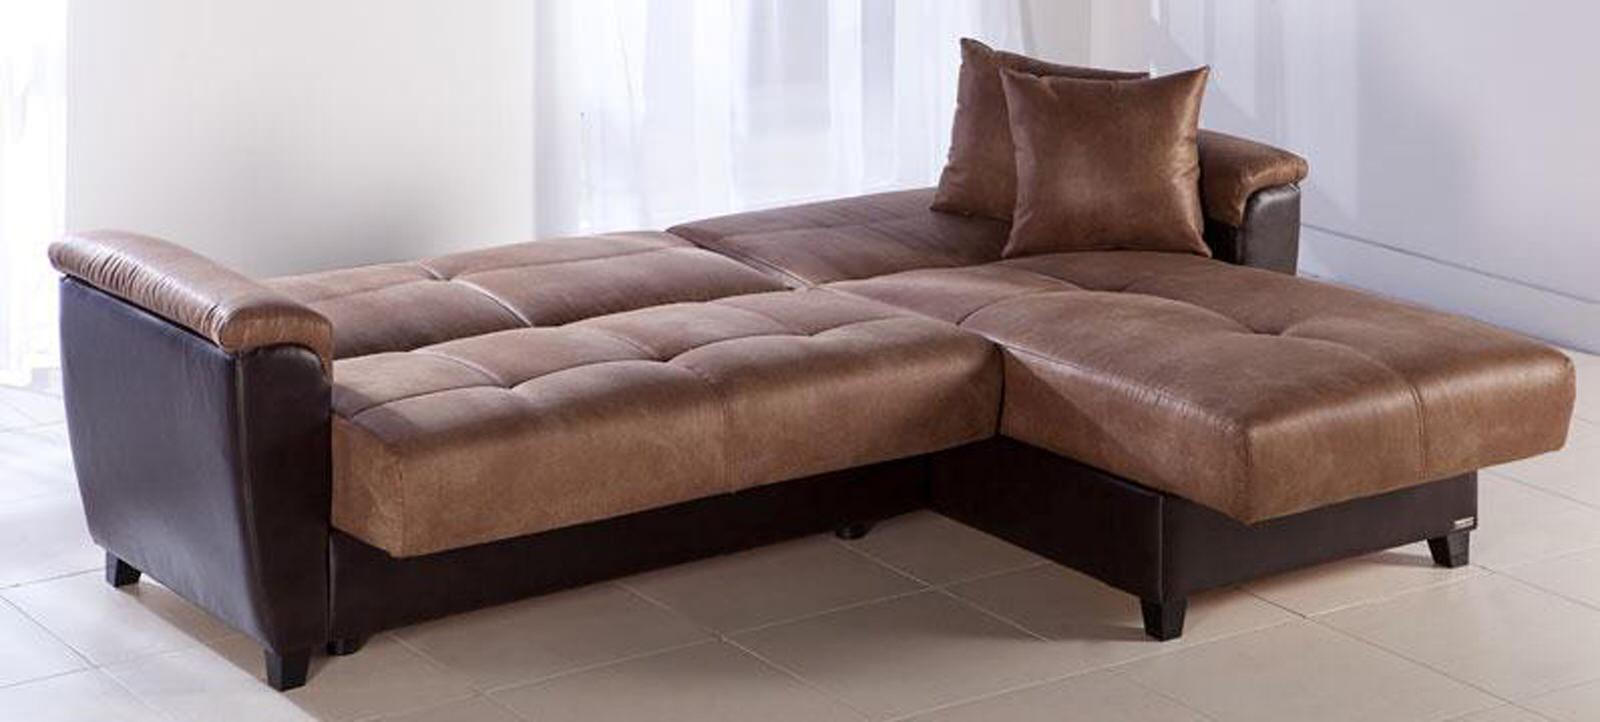 Mocha Sectional Sofa New Holiday Bargains On Simmons